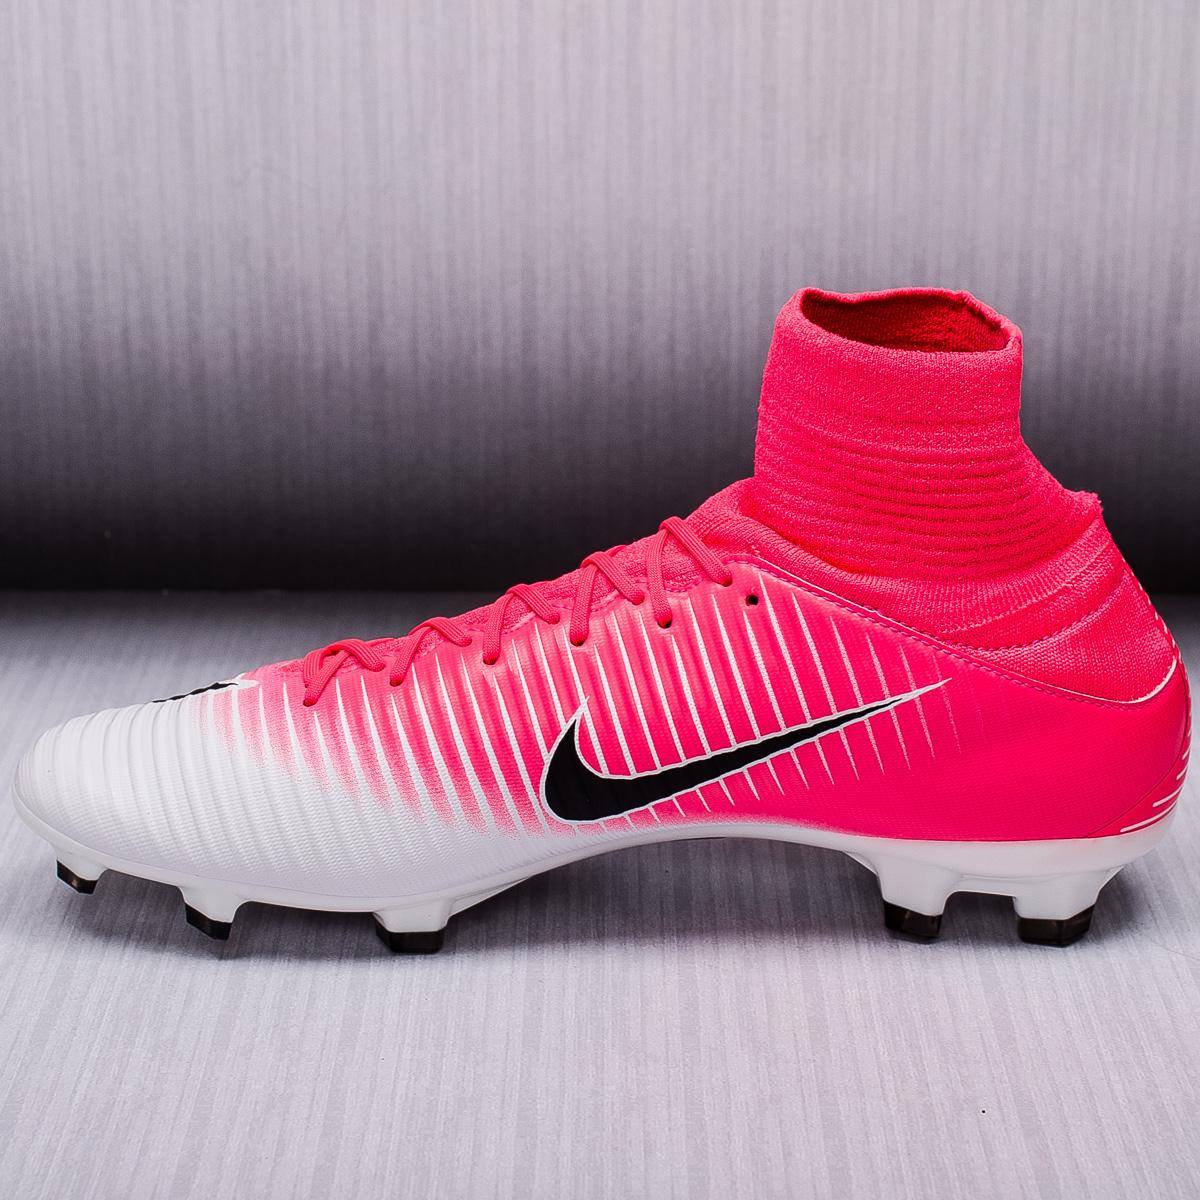 wholesale dealer 03b3c 7cc9d Nike Mercurial Veloce III DF FG Soccer Cleats